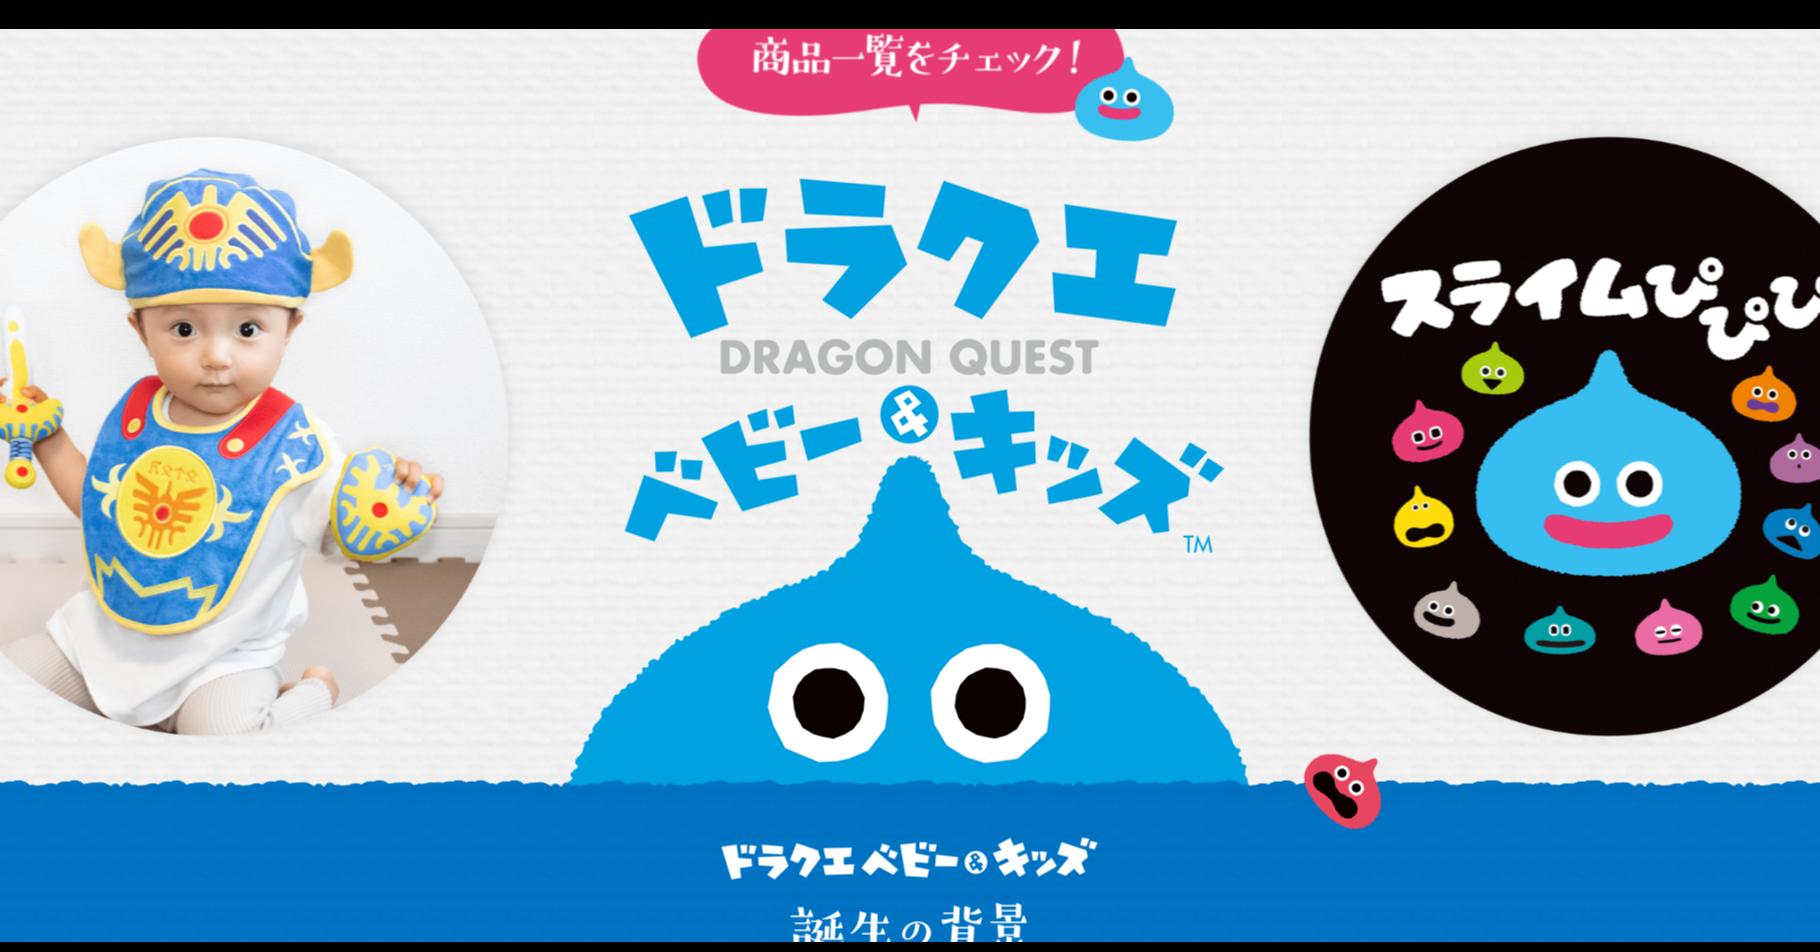 Dragon Quest, Dragon Quest XI, Dragon Quest X, , Square Enix Co., Ltd., Nintendo Switch, Video Games, , Nintendo, Enix, cartoon, Illustration, Graphic design